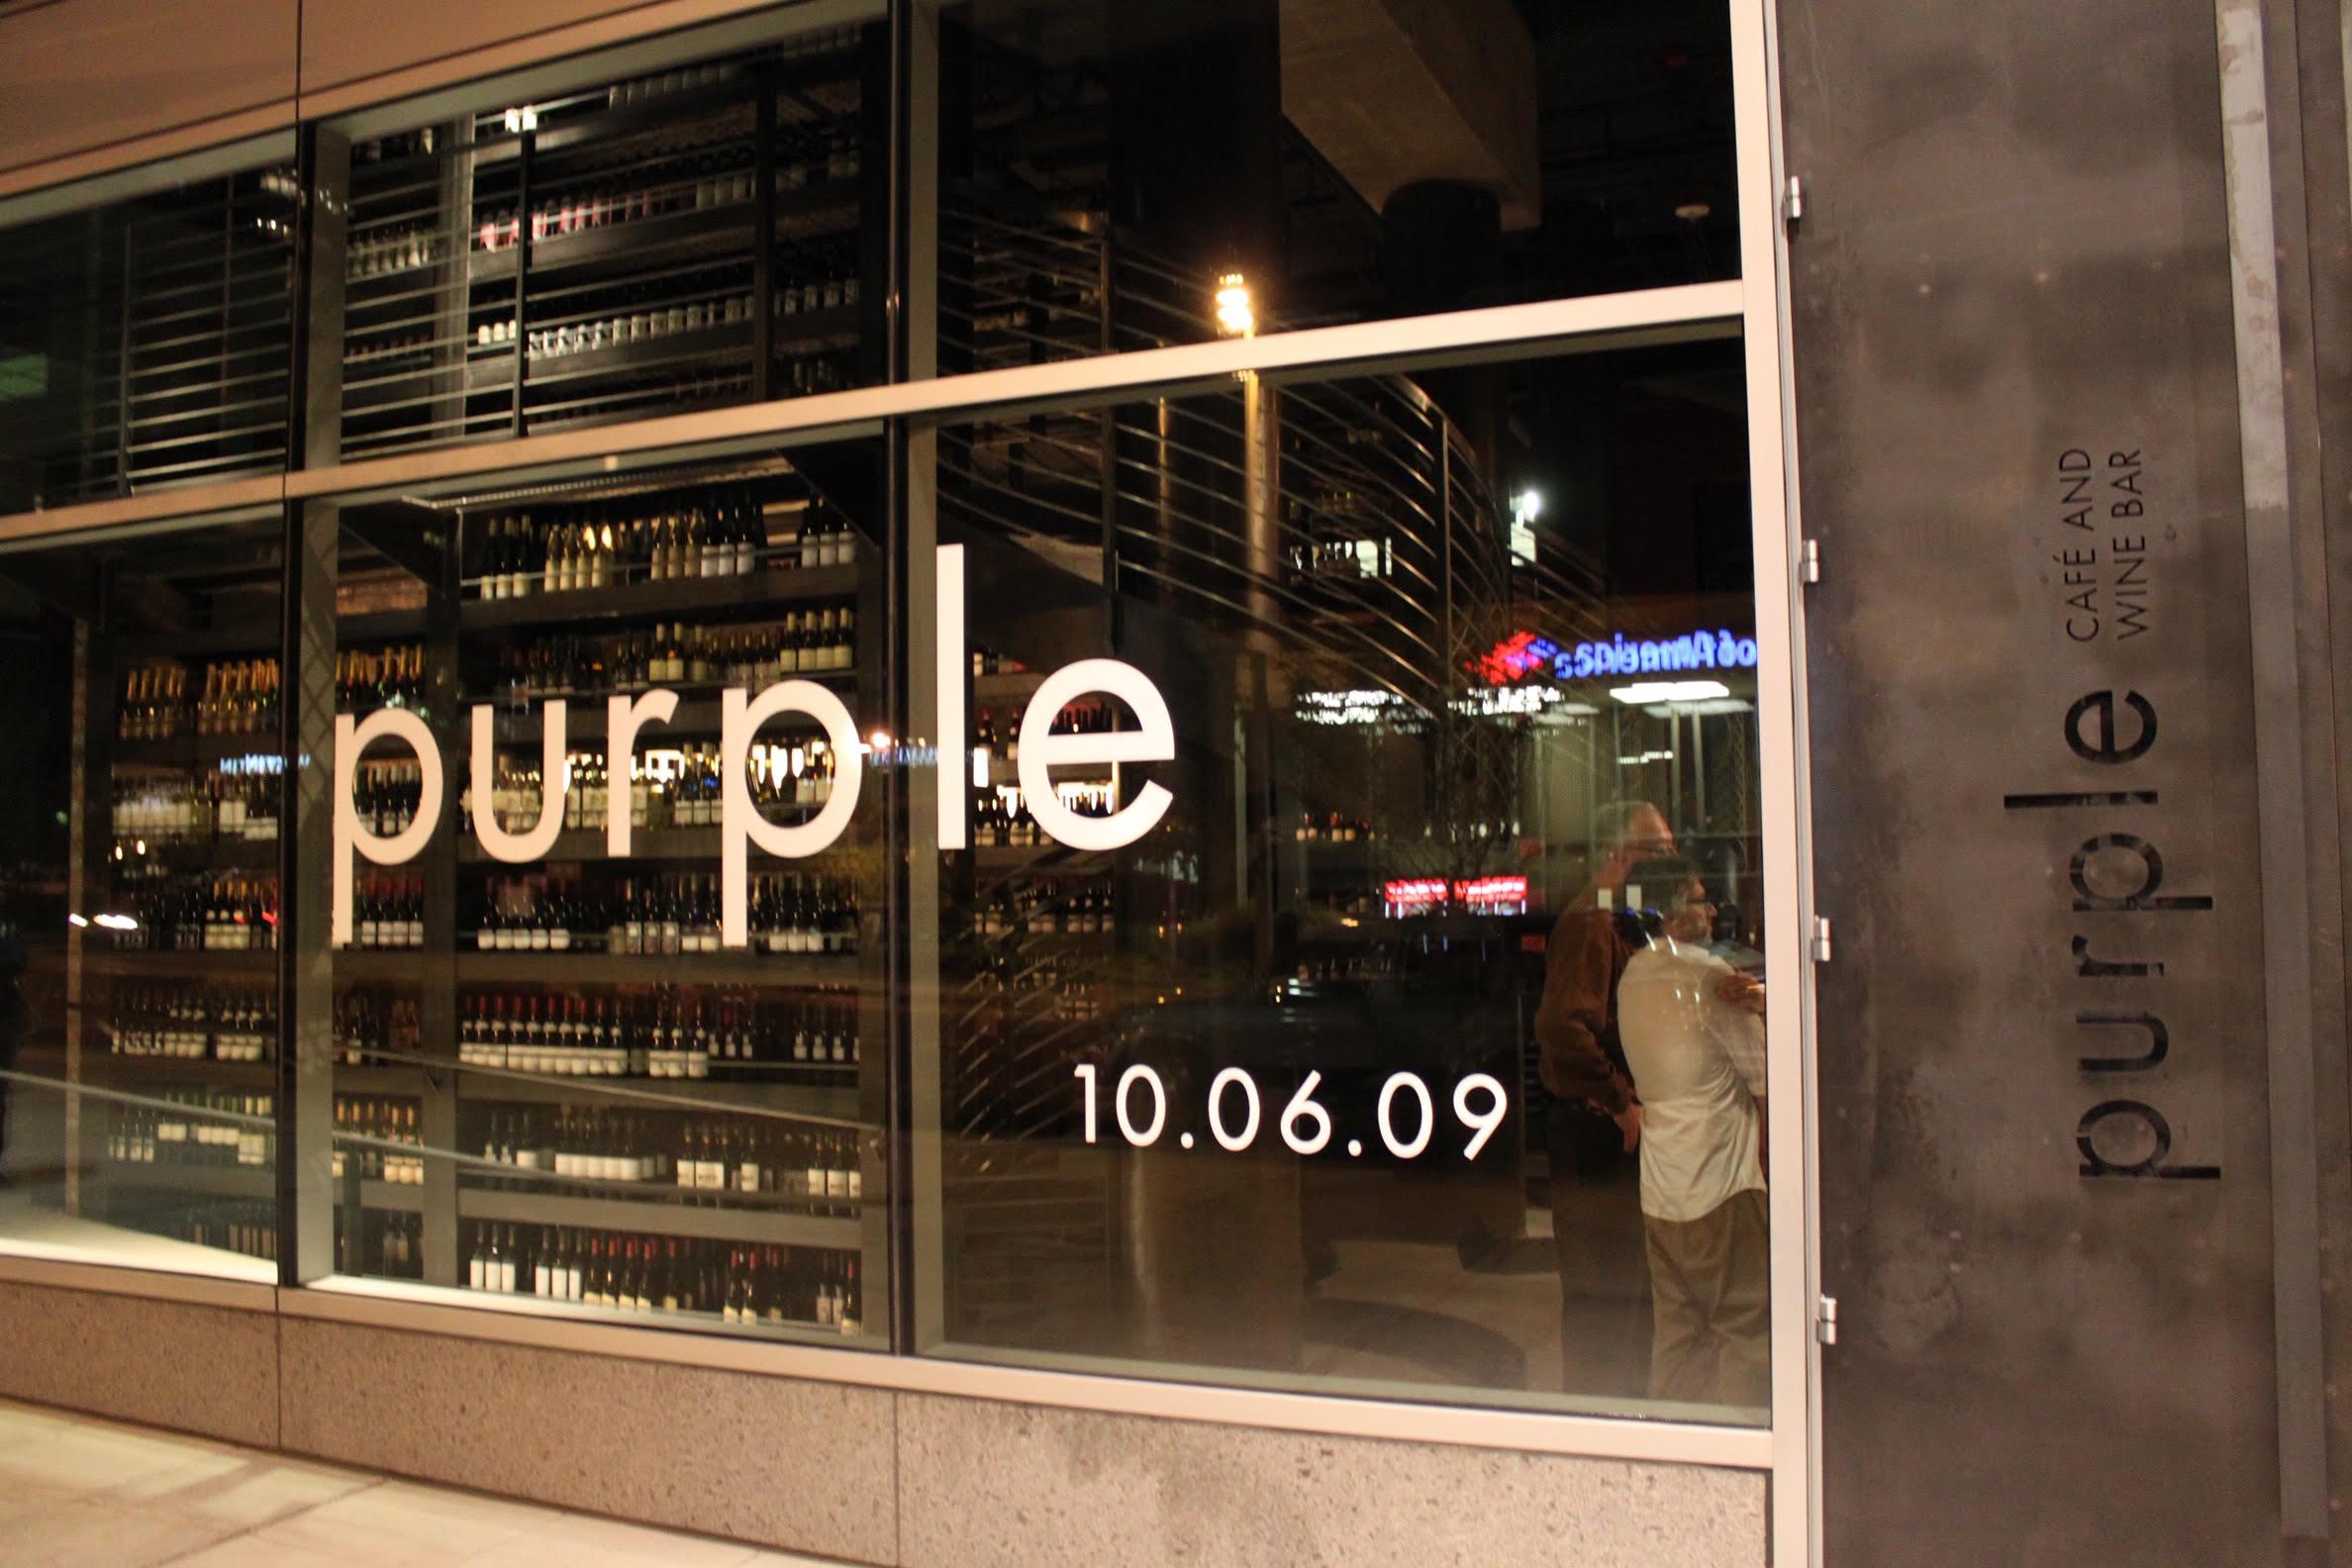 Purple Cafe, Lot No 3, Cast Iron Studios Close in Bellevue